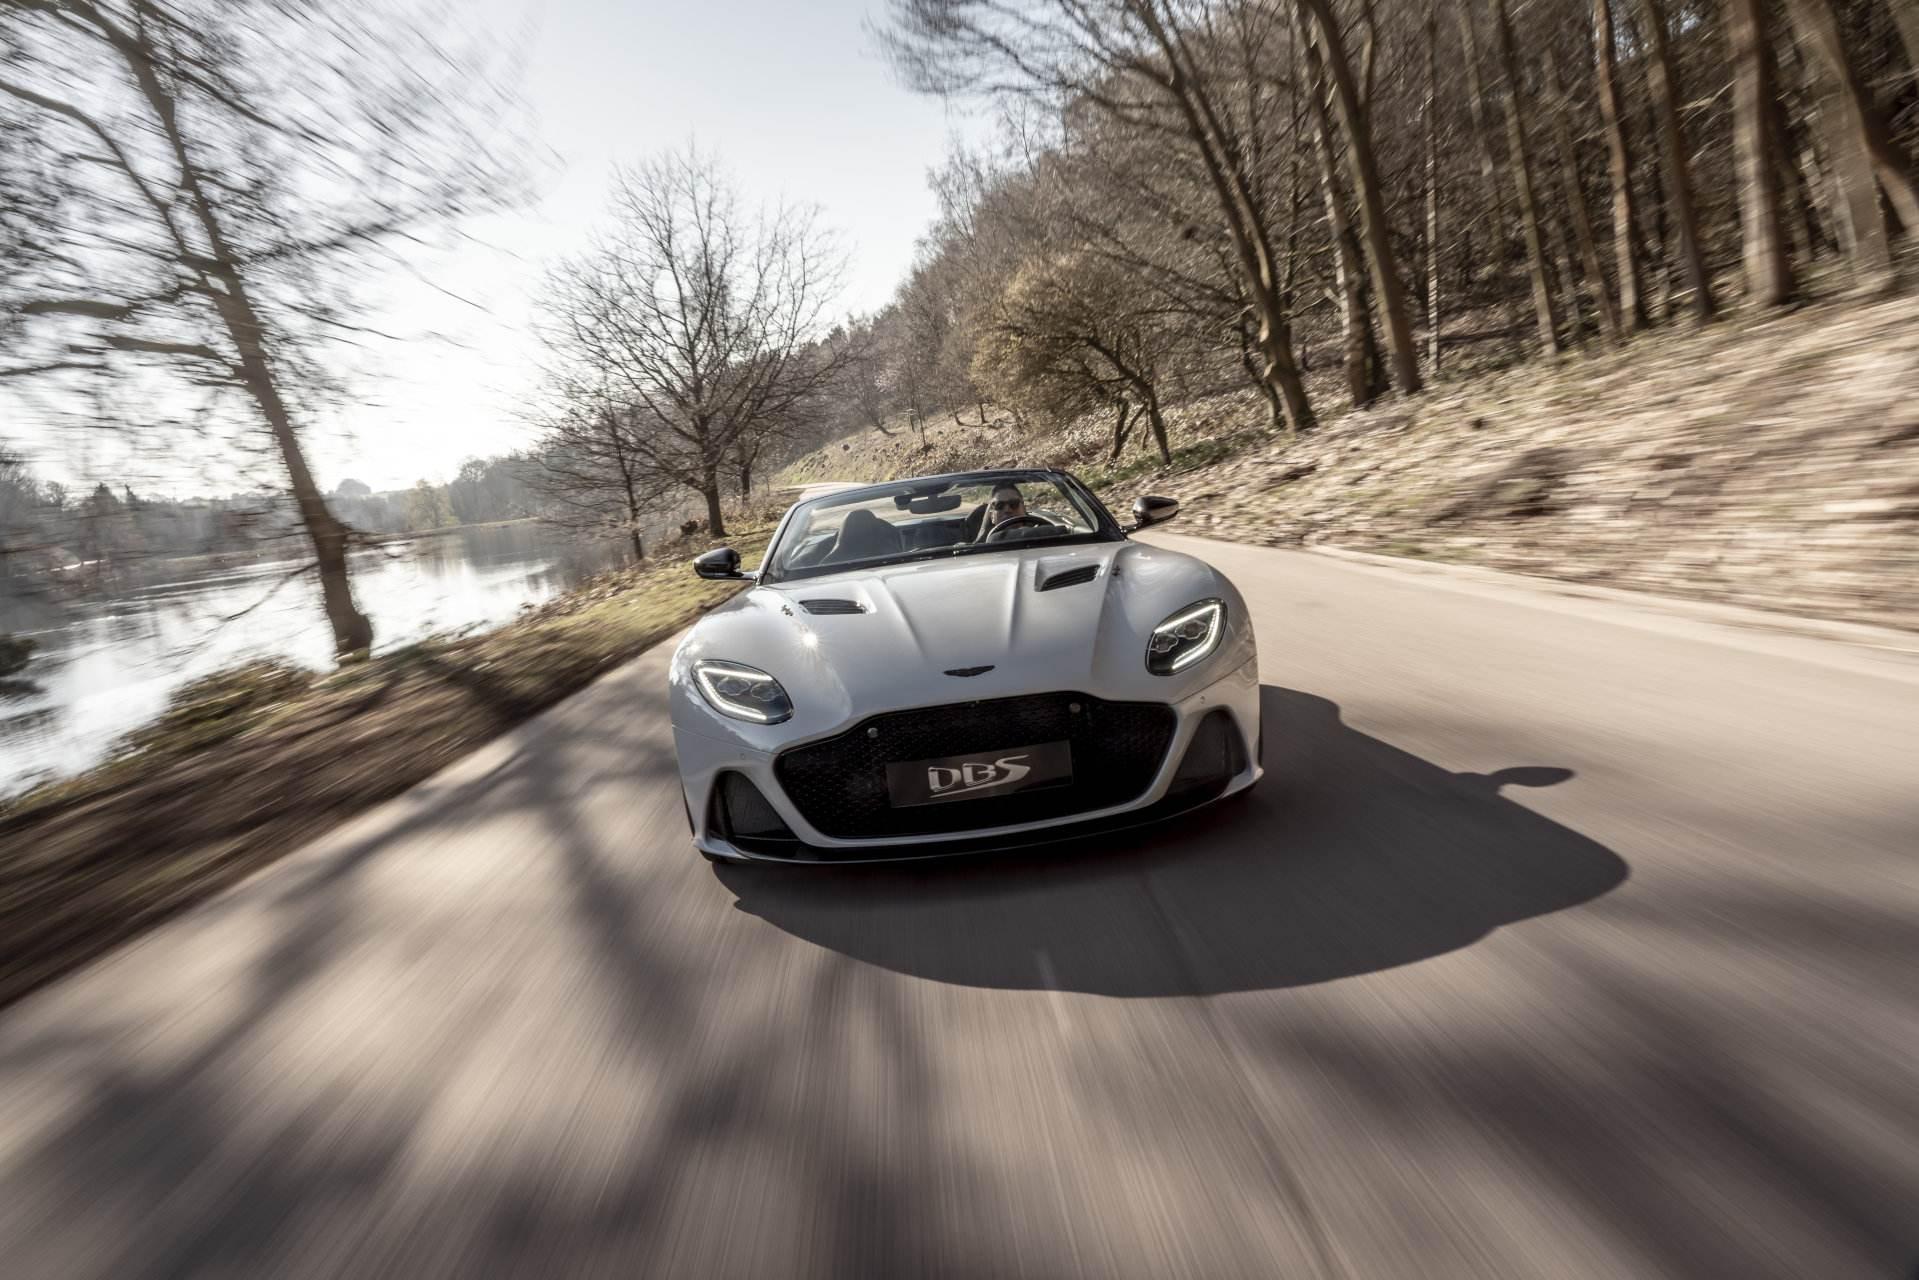 Aston Martin DBS Superleggera Volante 2019 06